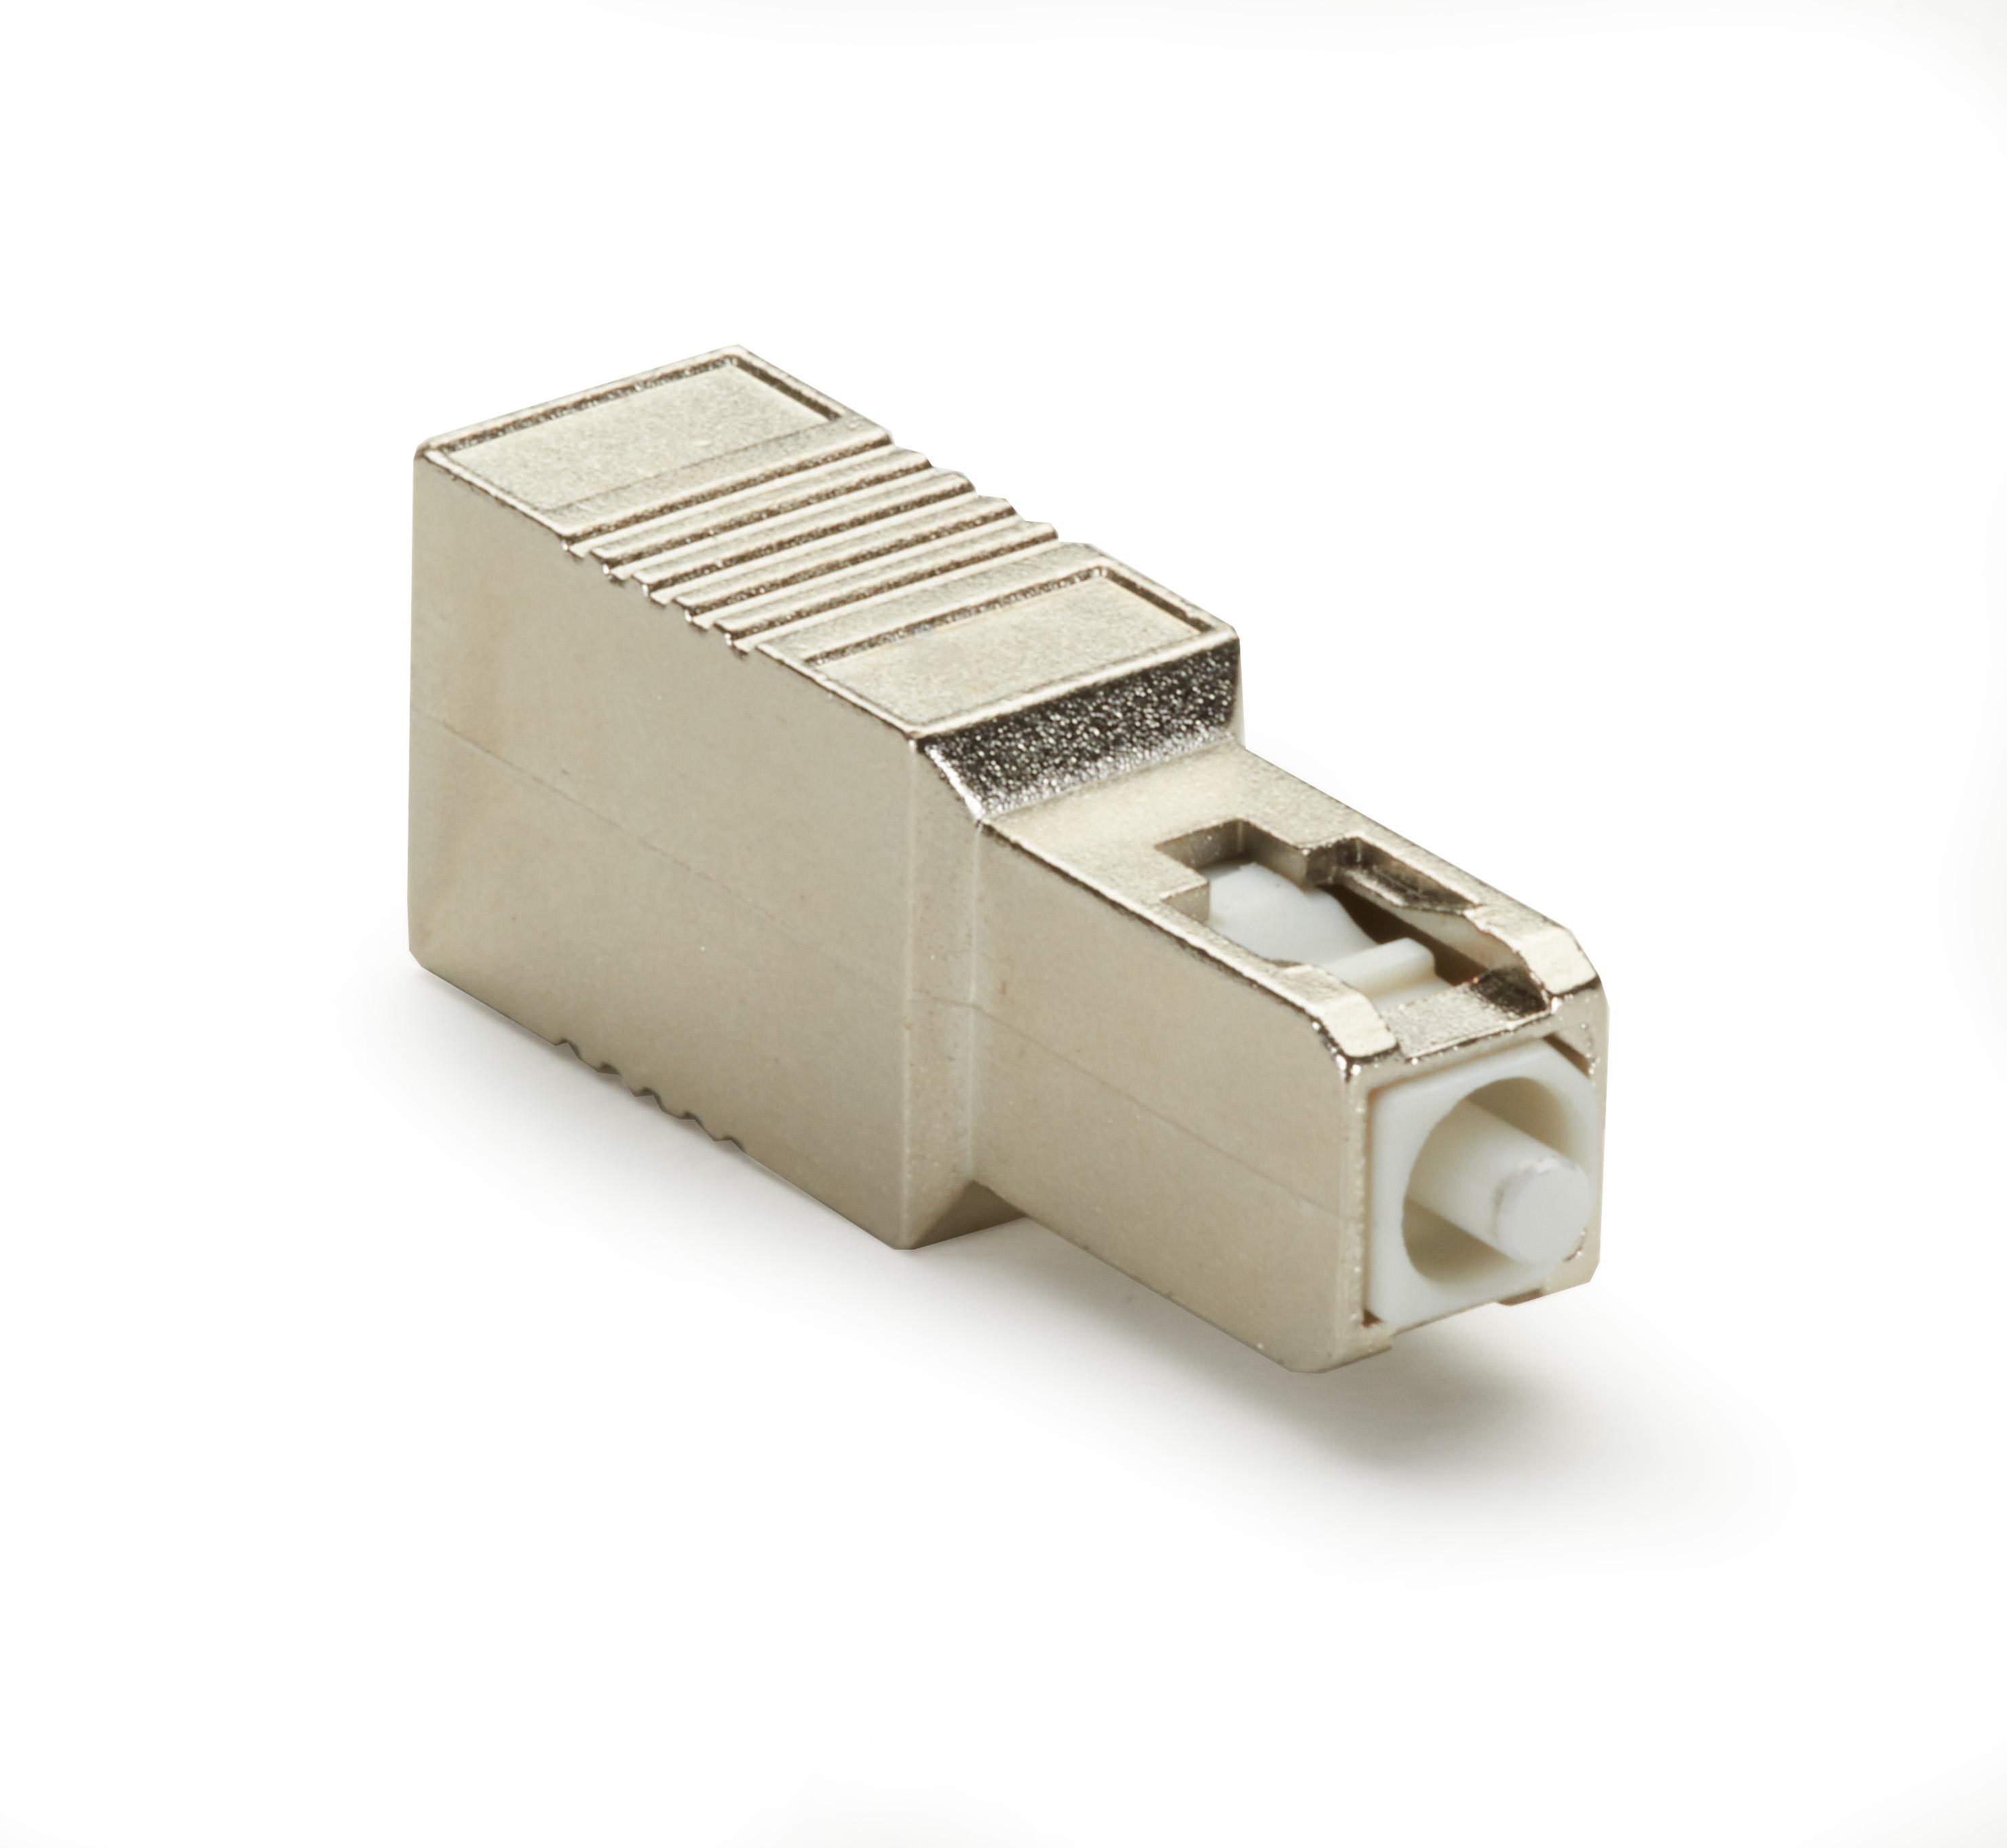 Fiber Optic In-Line Attenuator, Single-Mode, Male/Female, SC, UPC, 20 dB